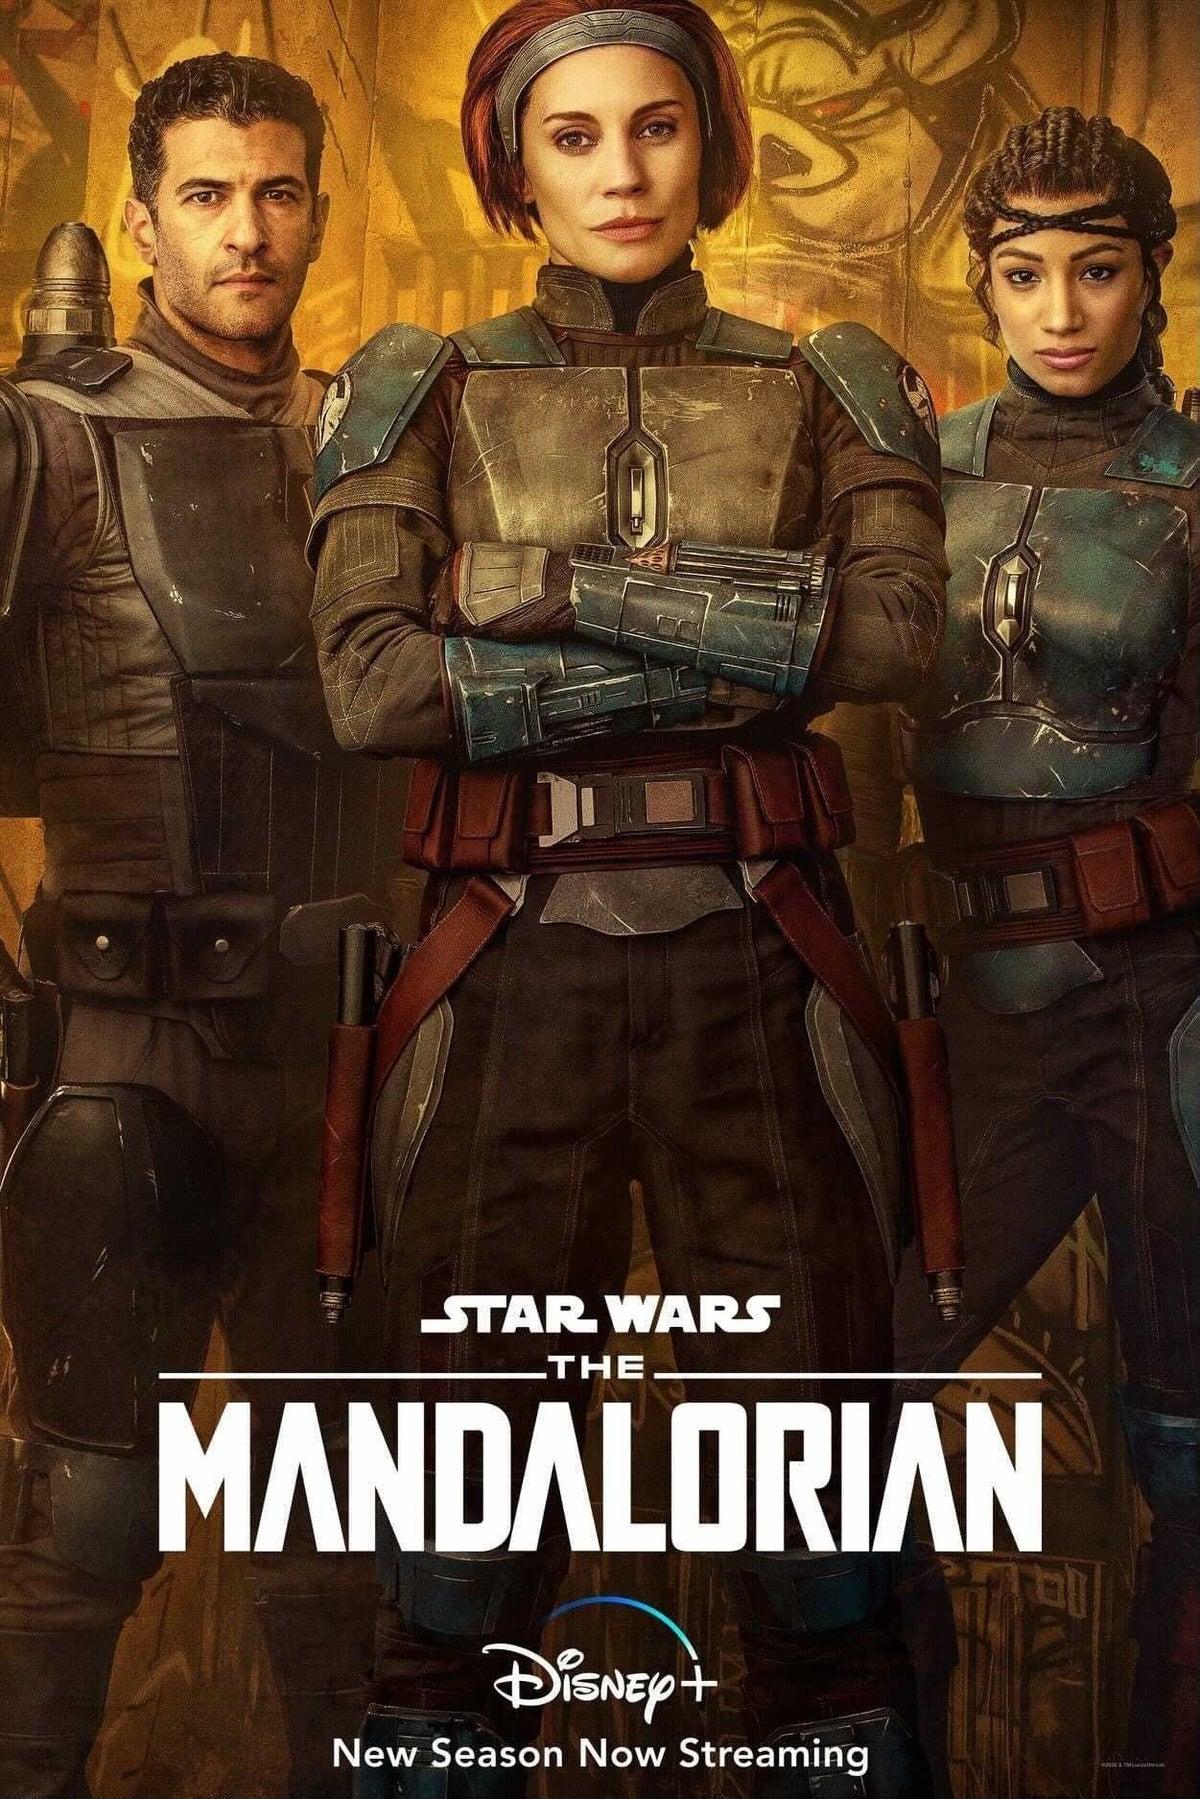 Star Wars The Mandalorian Bo Katan Kryze Koska Reeves Axe Woves Poster (Katee Sackhoff Sasha Banks)